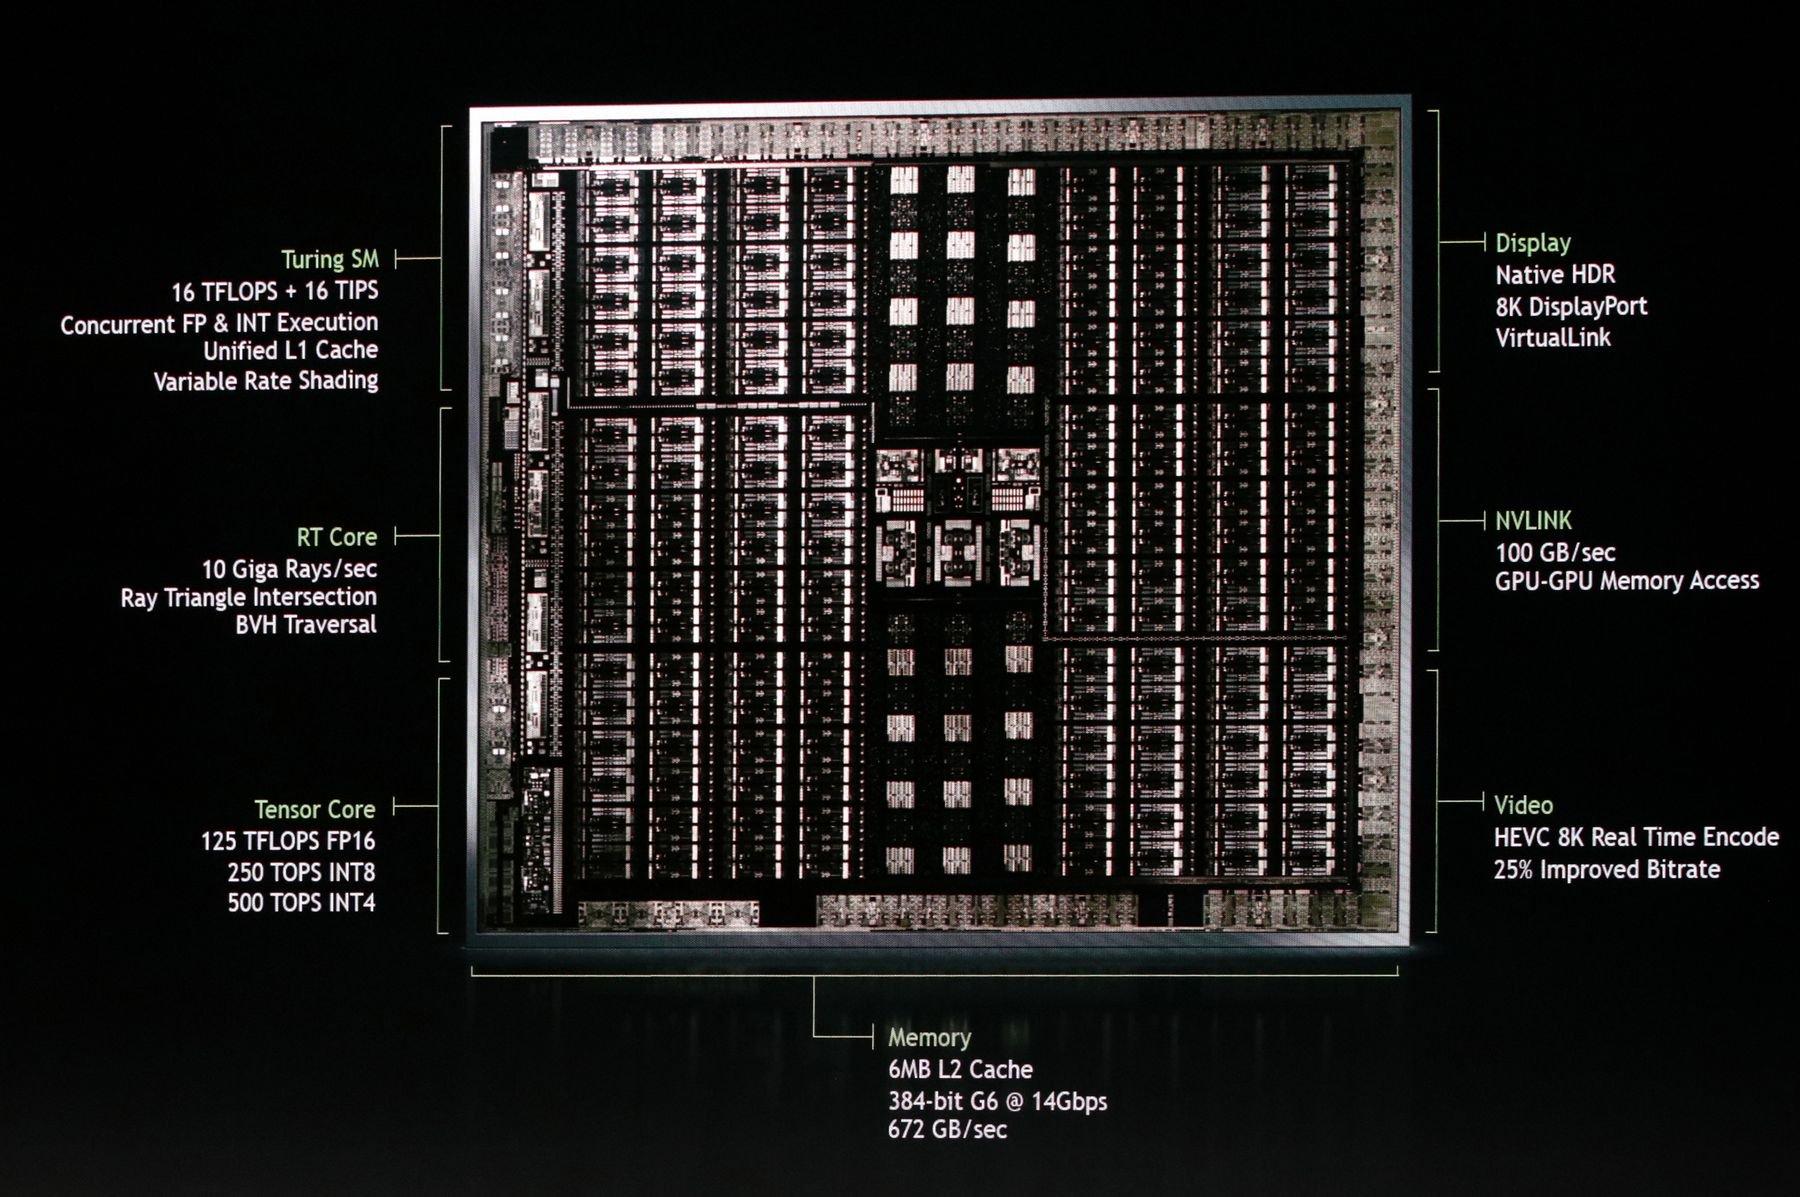 Schemat blokowy NVIDIA Turing GPU